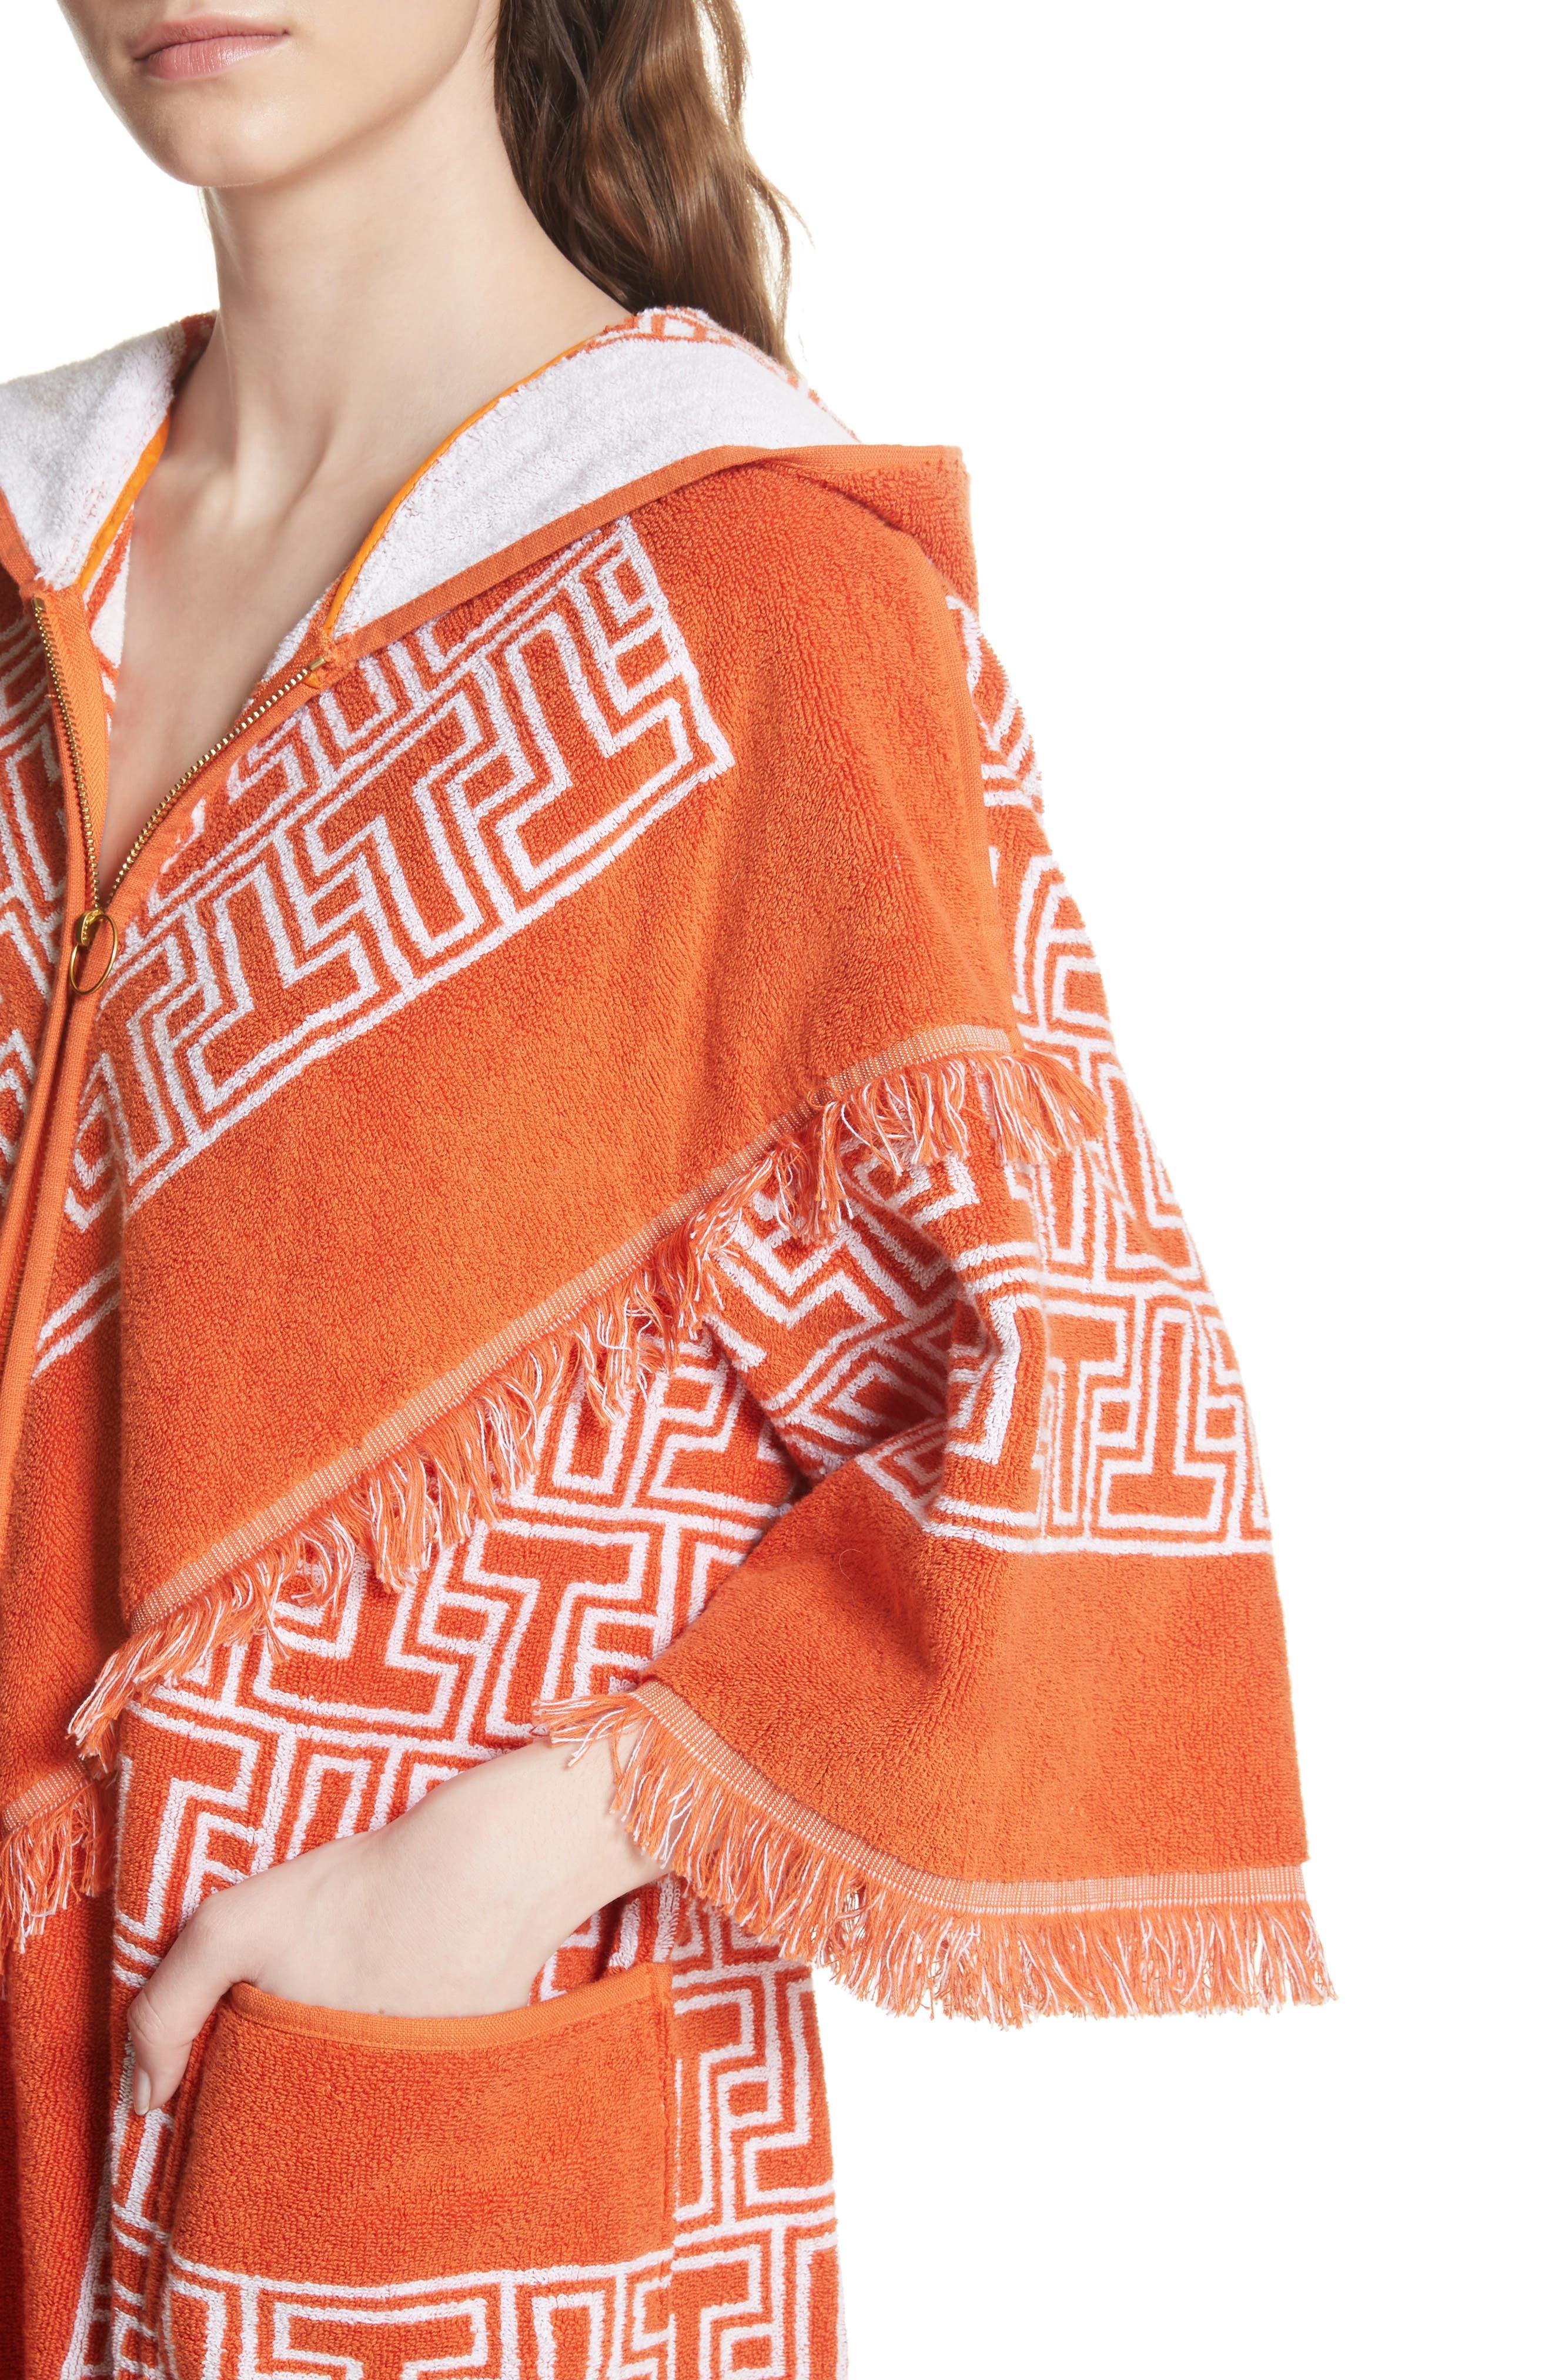 Tile T Terry Coat,                             Alternate thumbnail 4, color,                             Orange Towel Jacquard